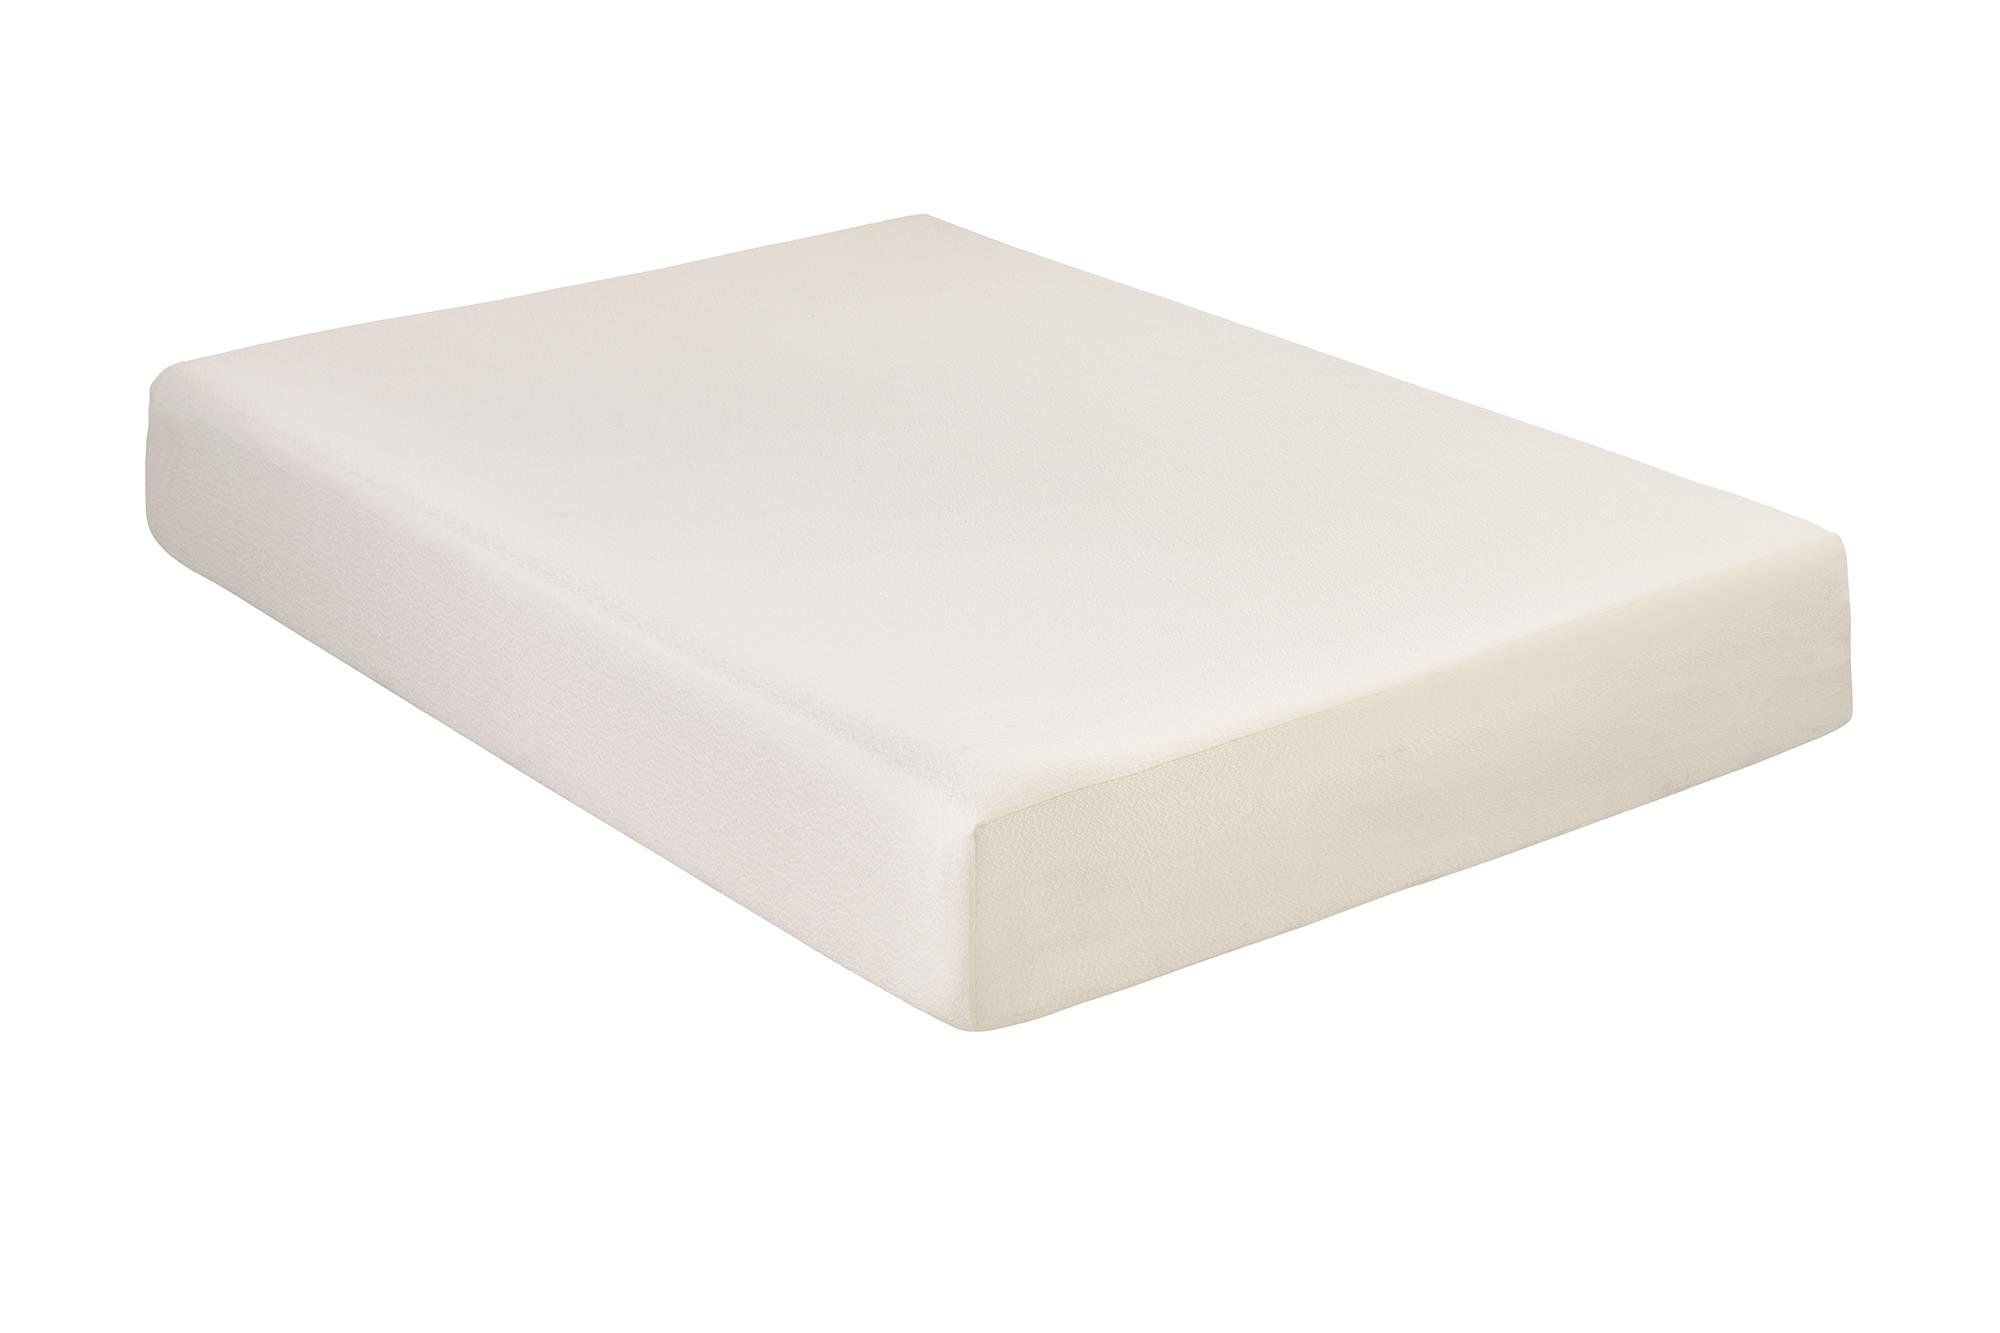 Signature Sleep Memoir 12 Inch Memory Foam Mattress With